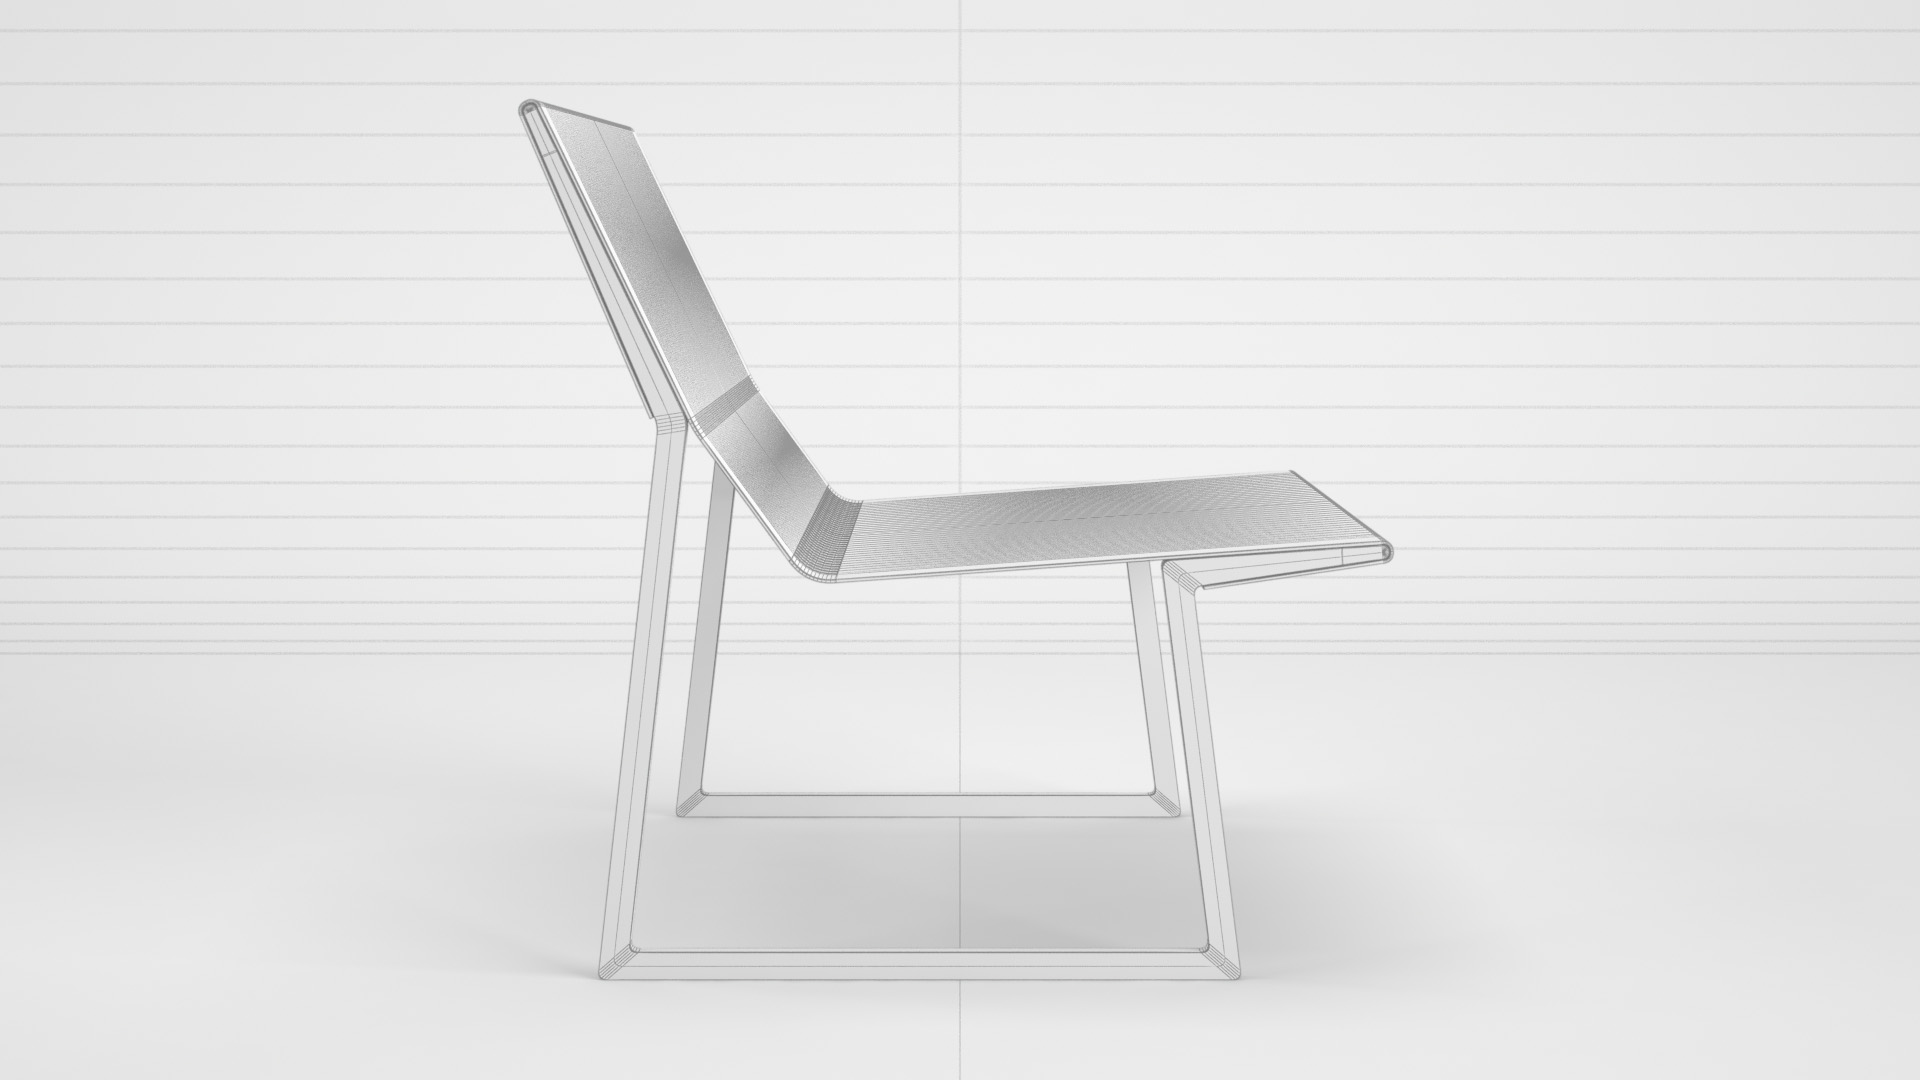 Tribu_Bird_Chair_WhiteSet_01_wire_0002